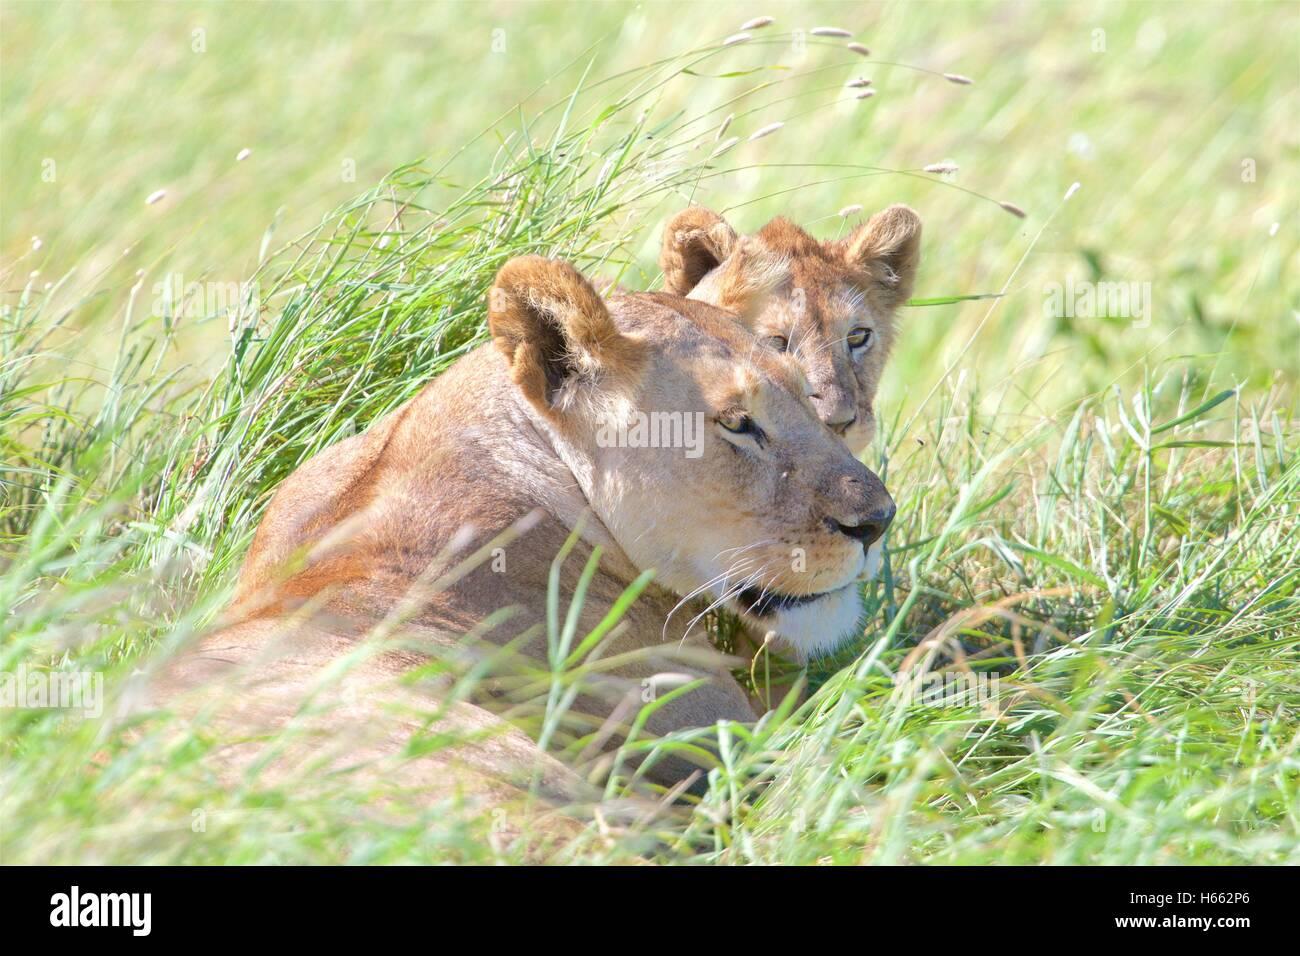 On safari in Serengeti National Park, Tanzania. - Stock Image